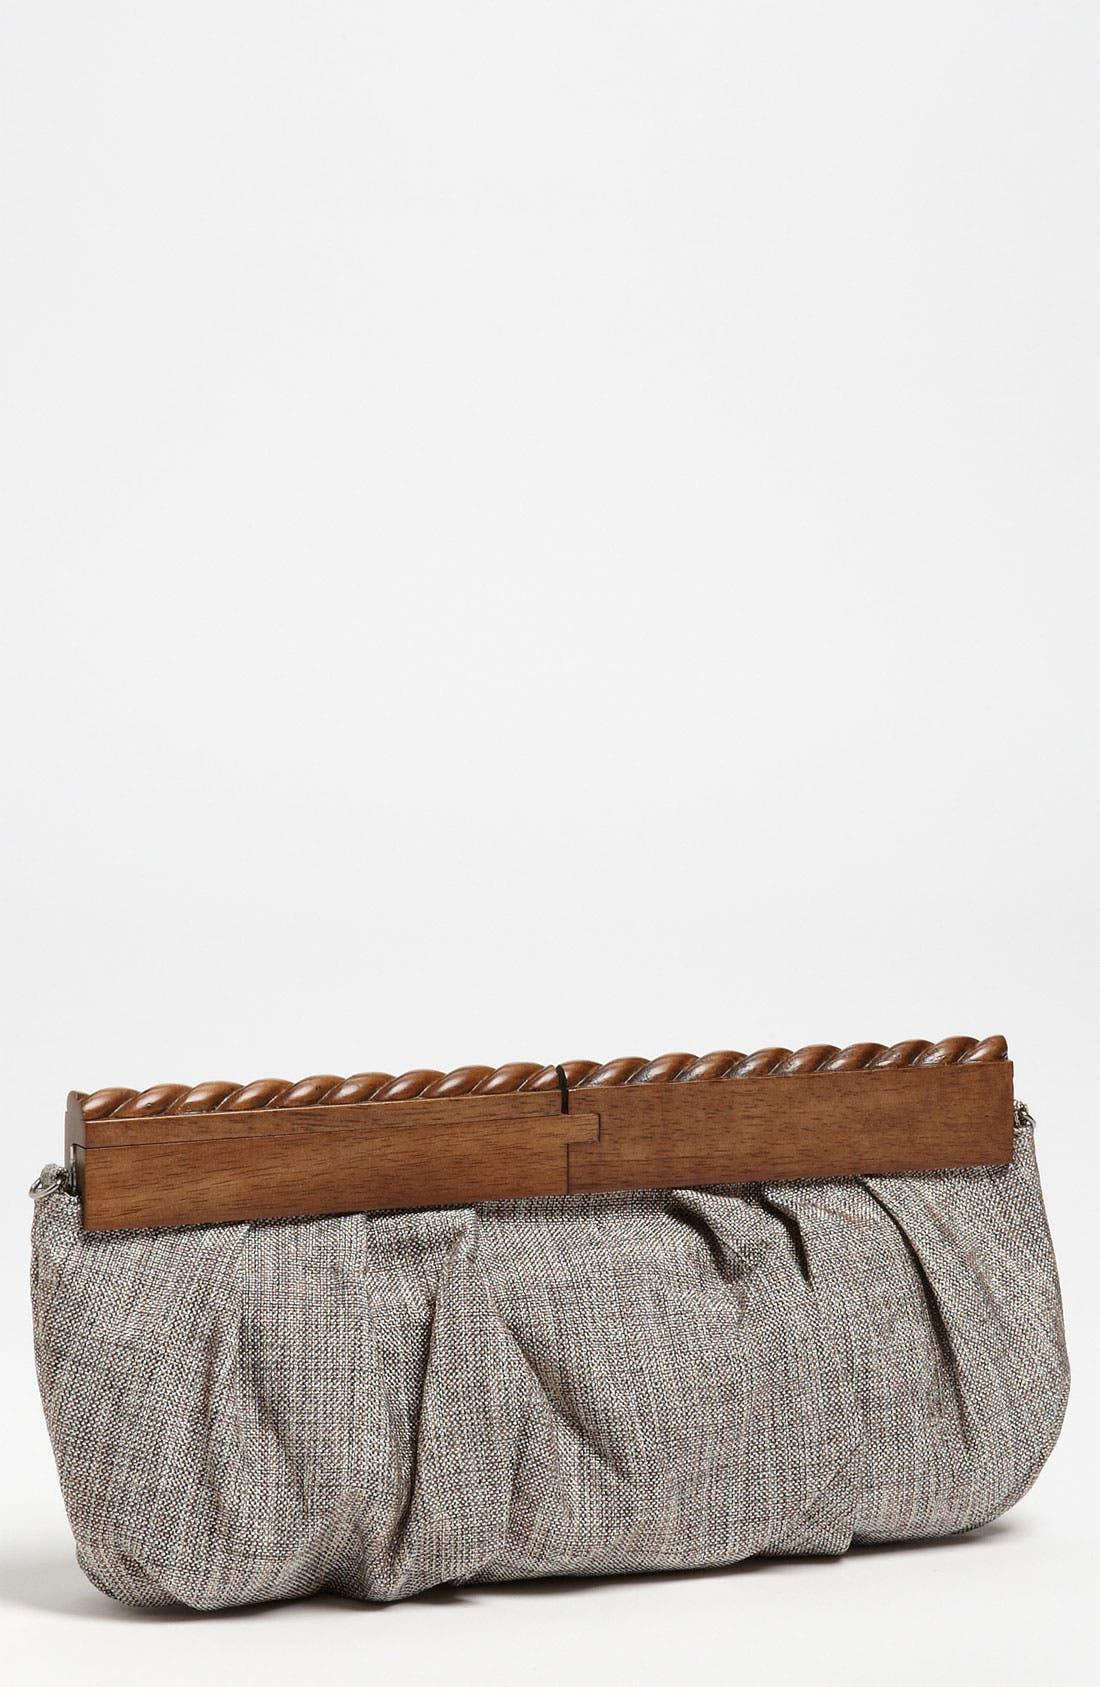 SR Squared by Sondra Roberts Linen & Wood Clutch,                         Main,                         color,